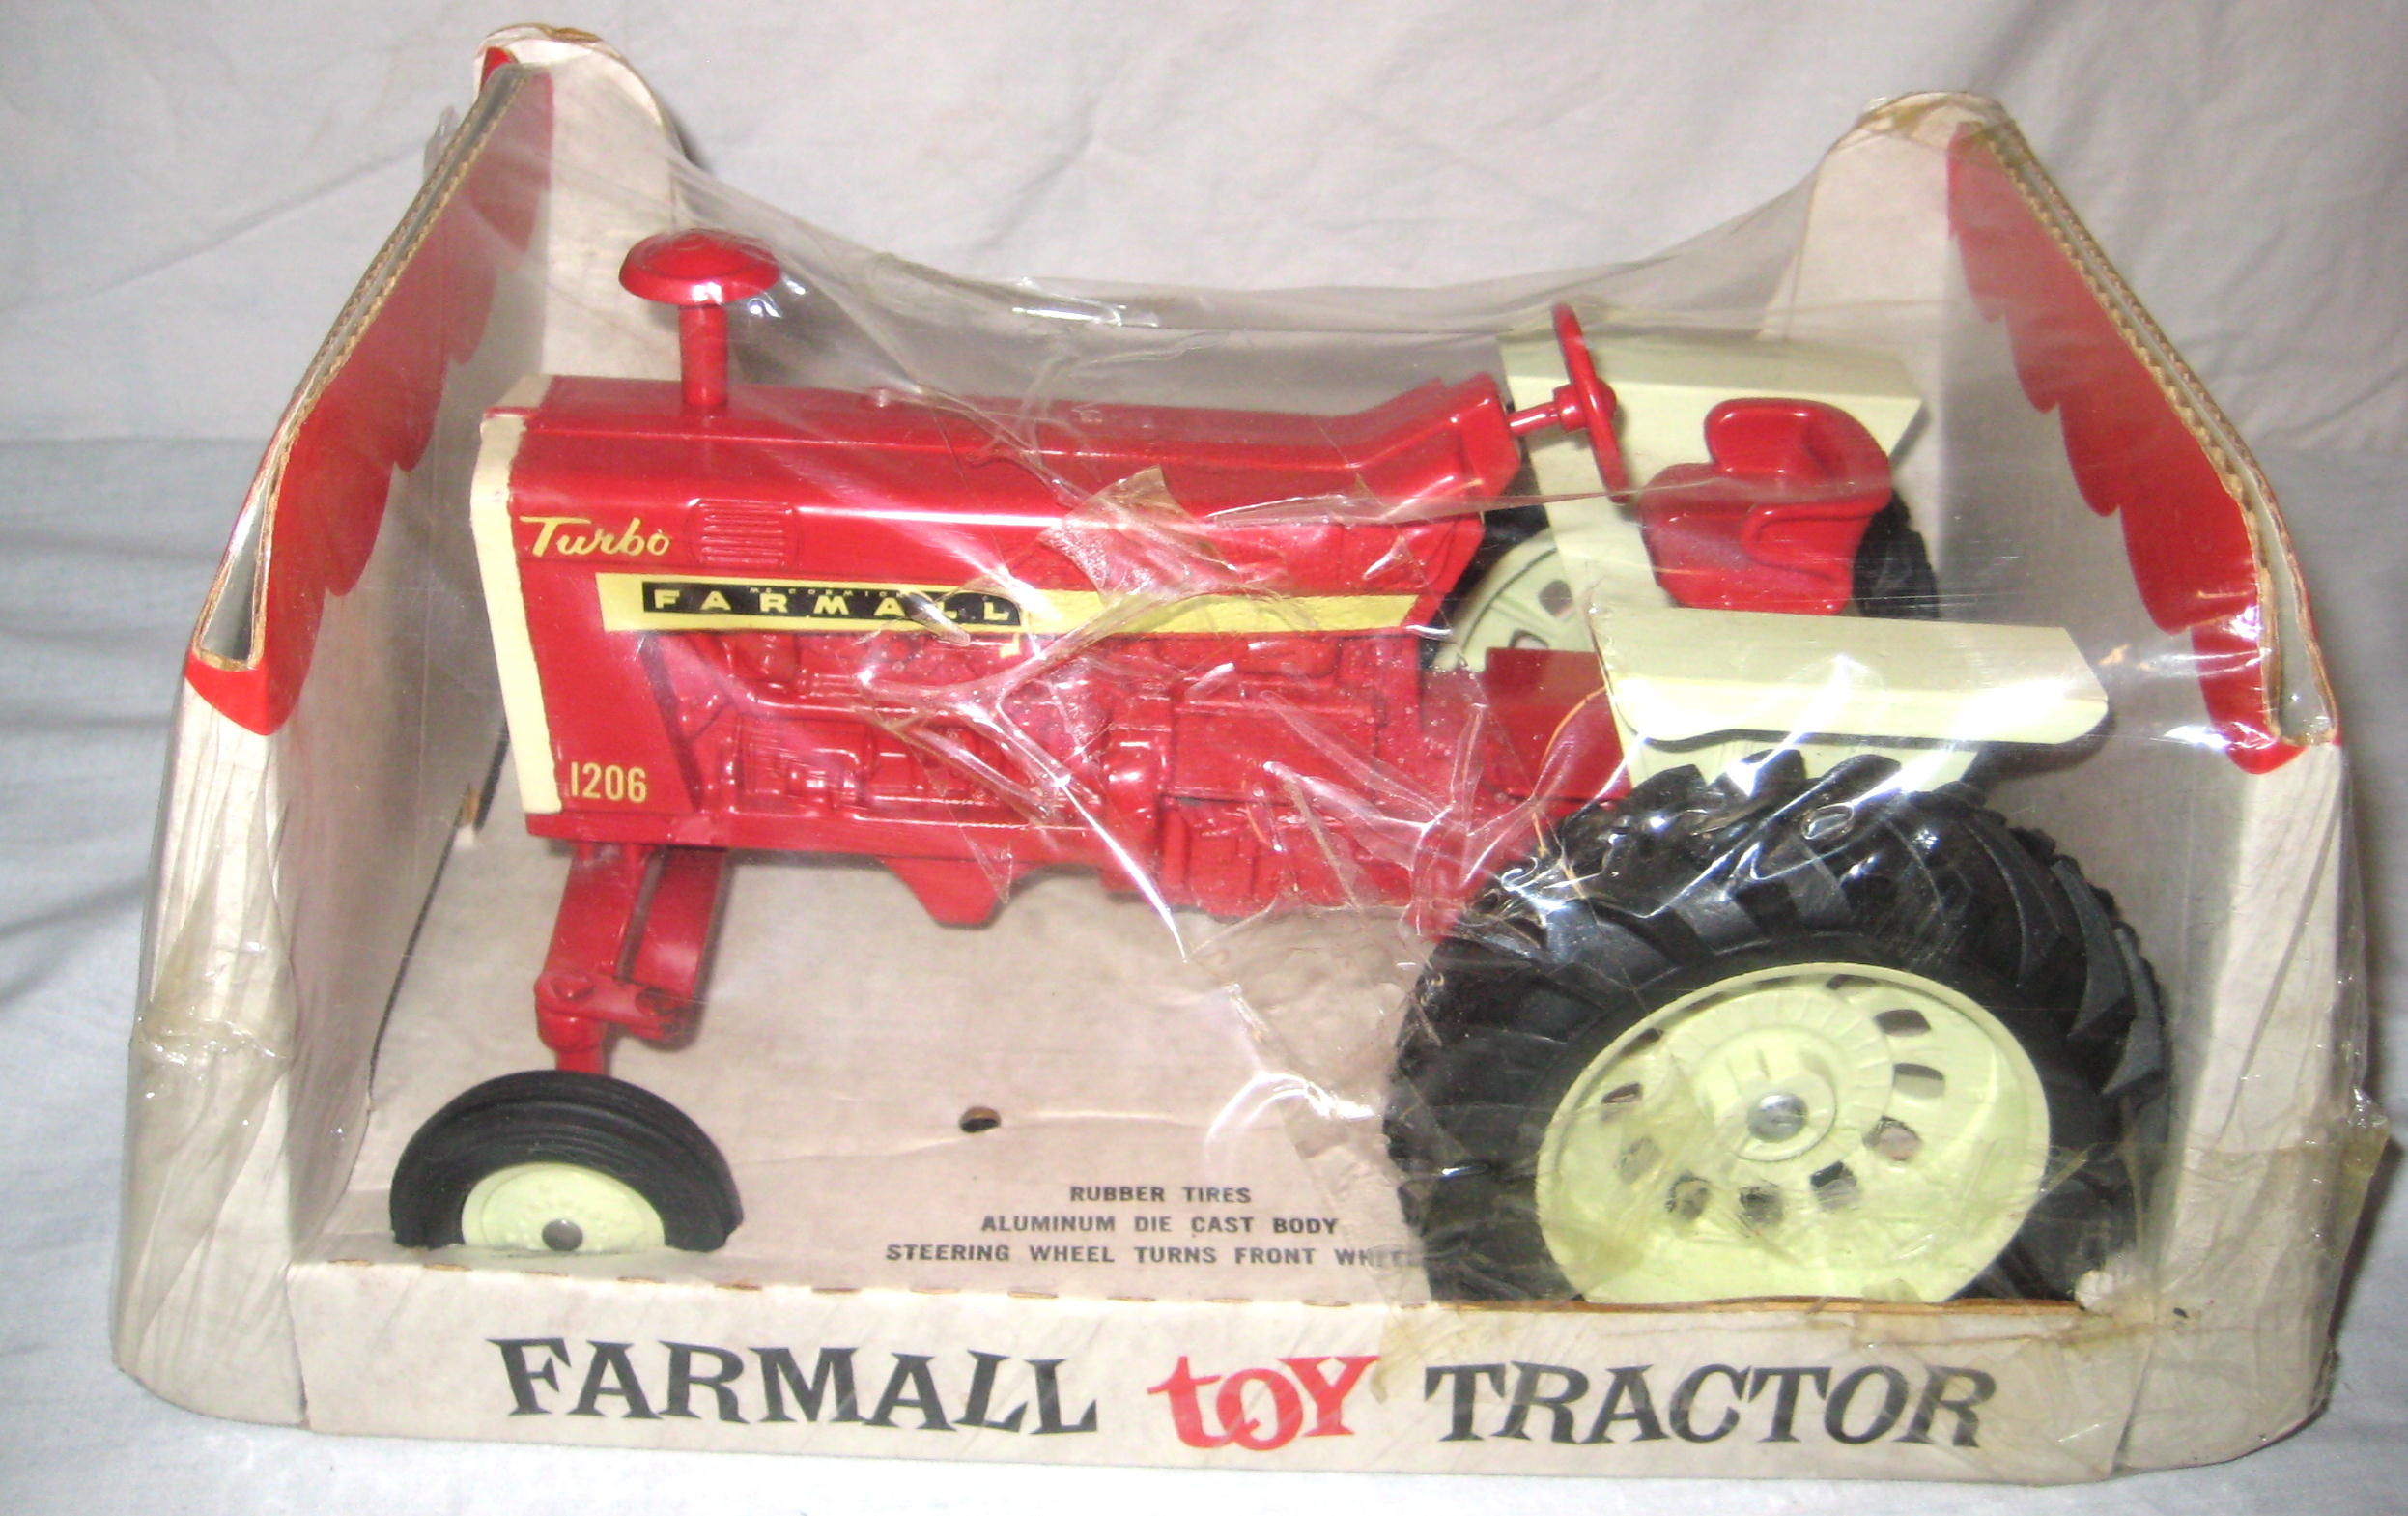 Farm Toy Auction 1206 International Tractor Wiring Jan 2016 Toys 309 426010 Bytes